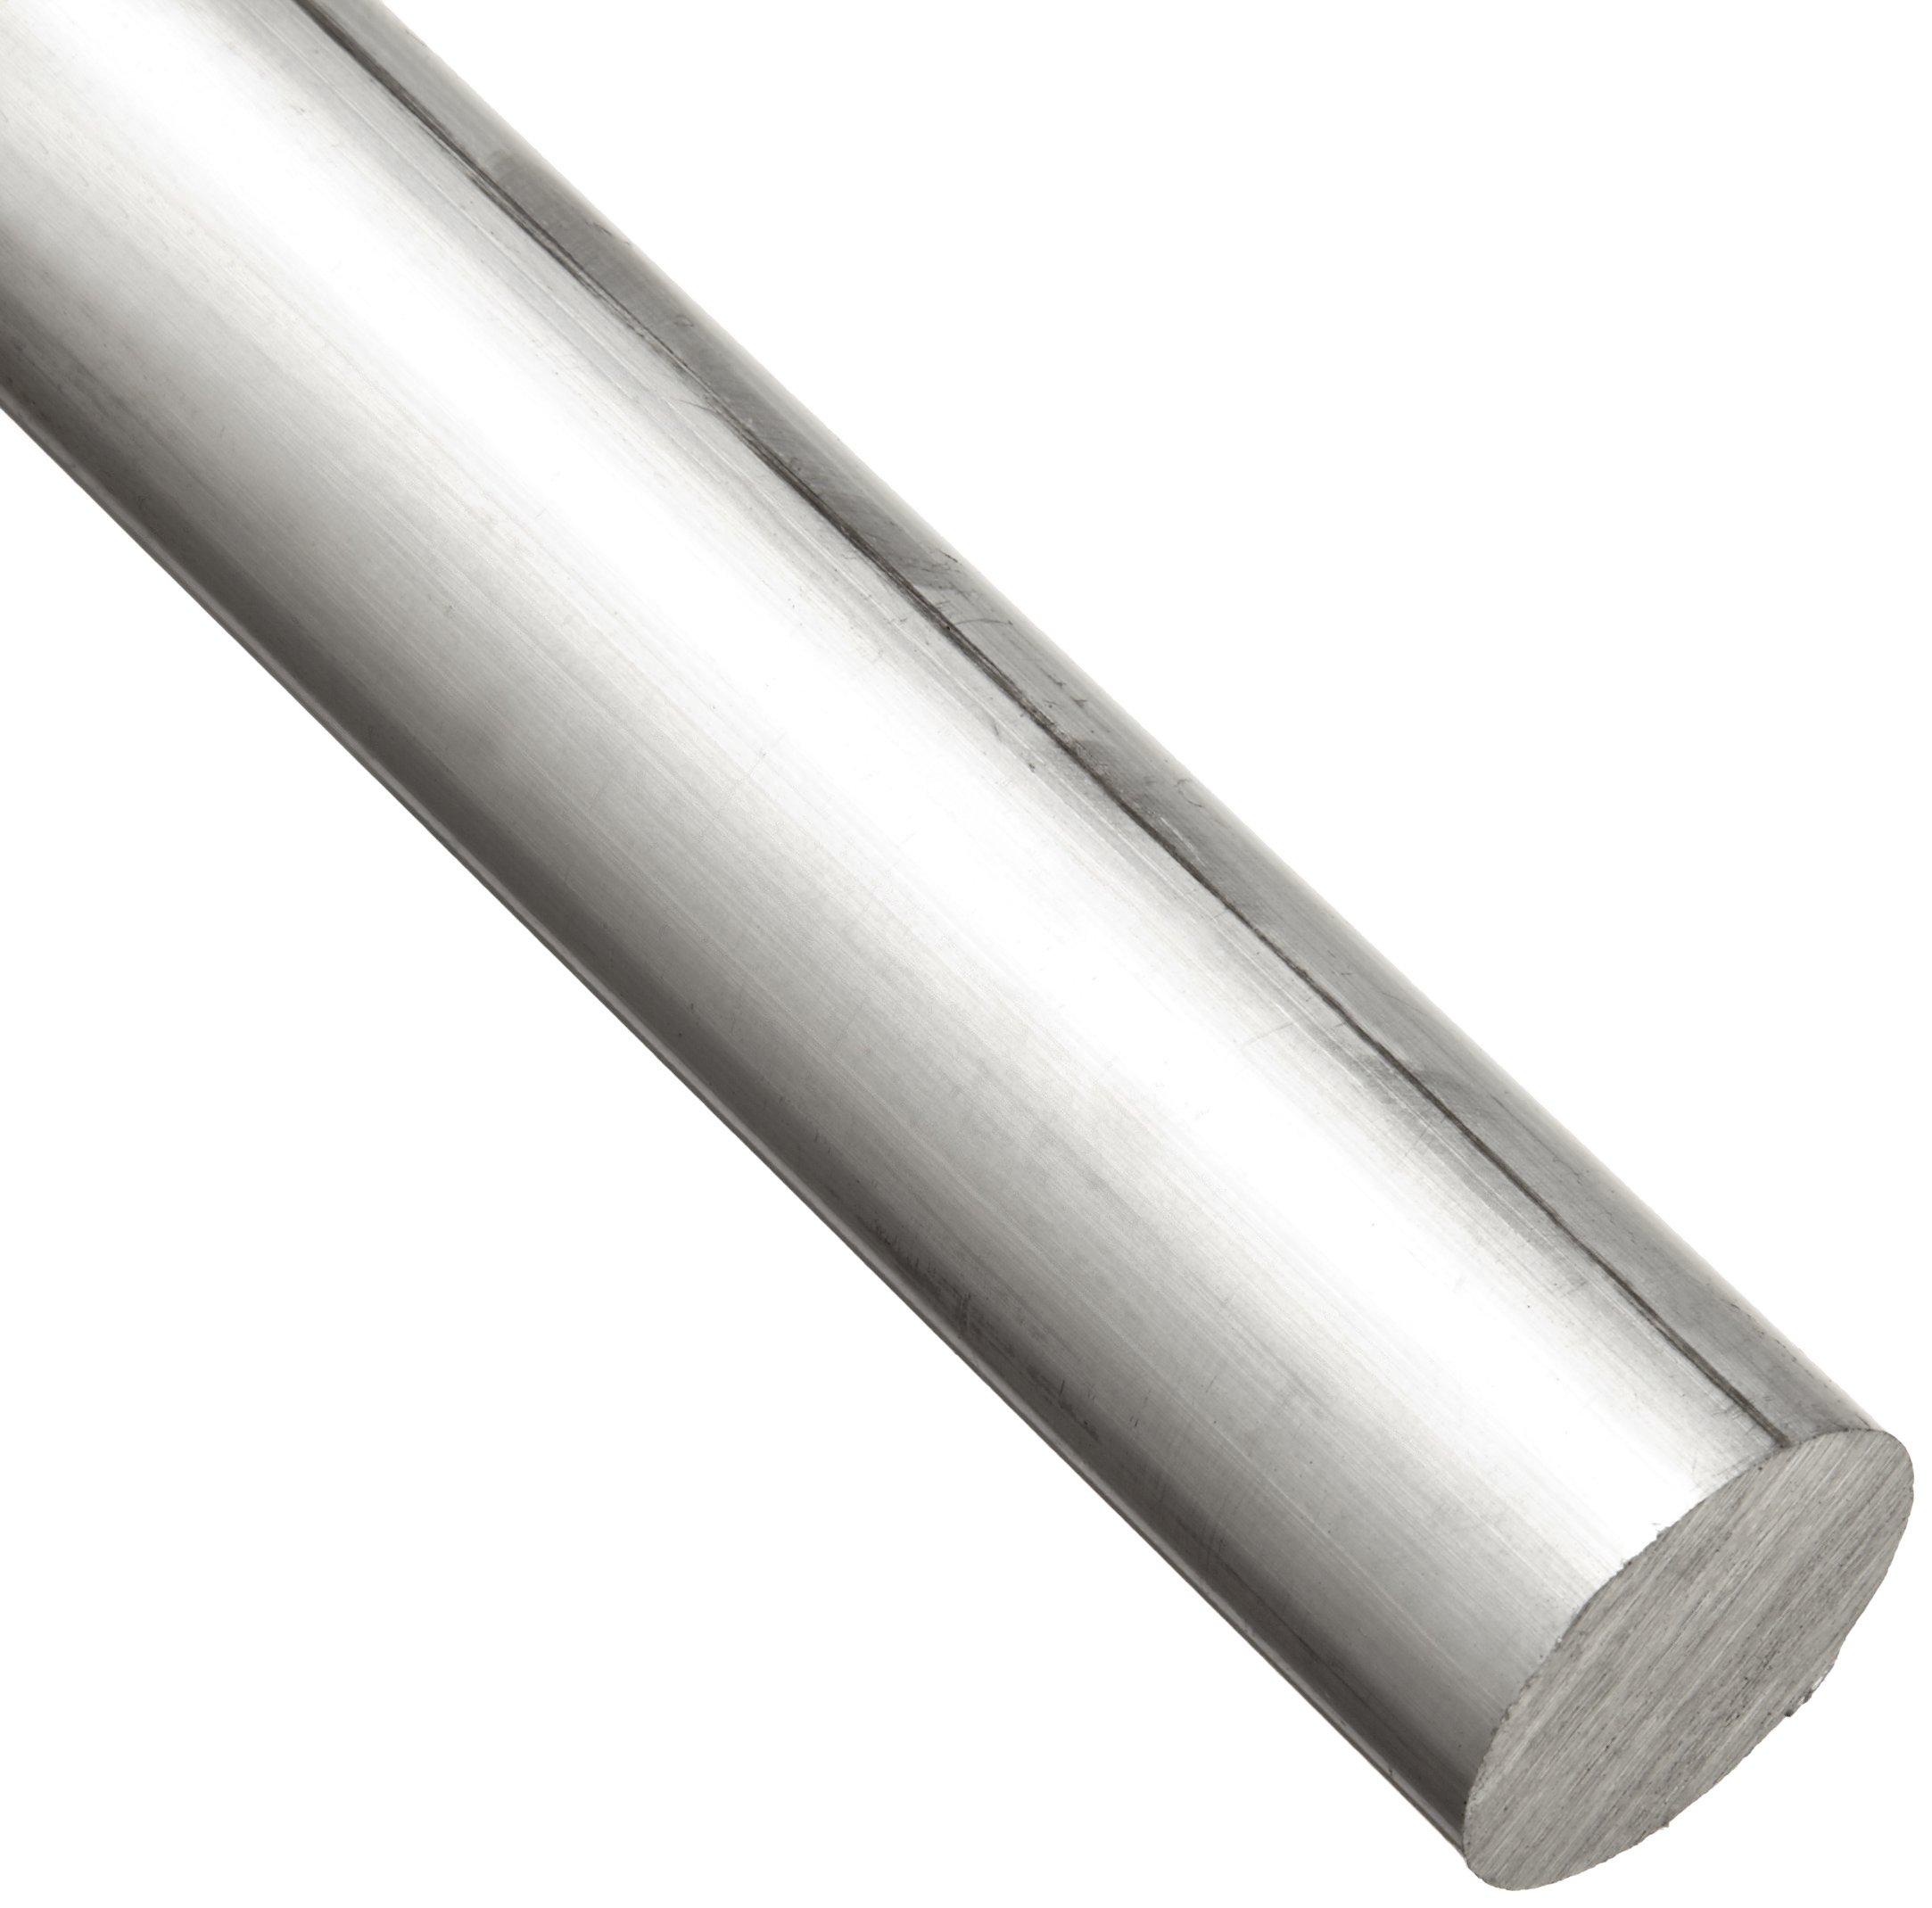 Meets ASTM D4020 Ultra High Molecular Weight Polyethylene 1 Length 1 Diameter UHMW Opaque White Round Rod